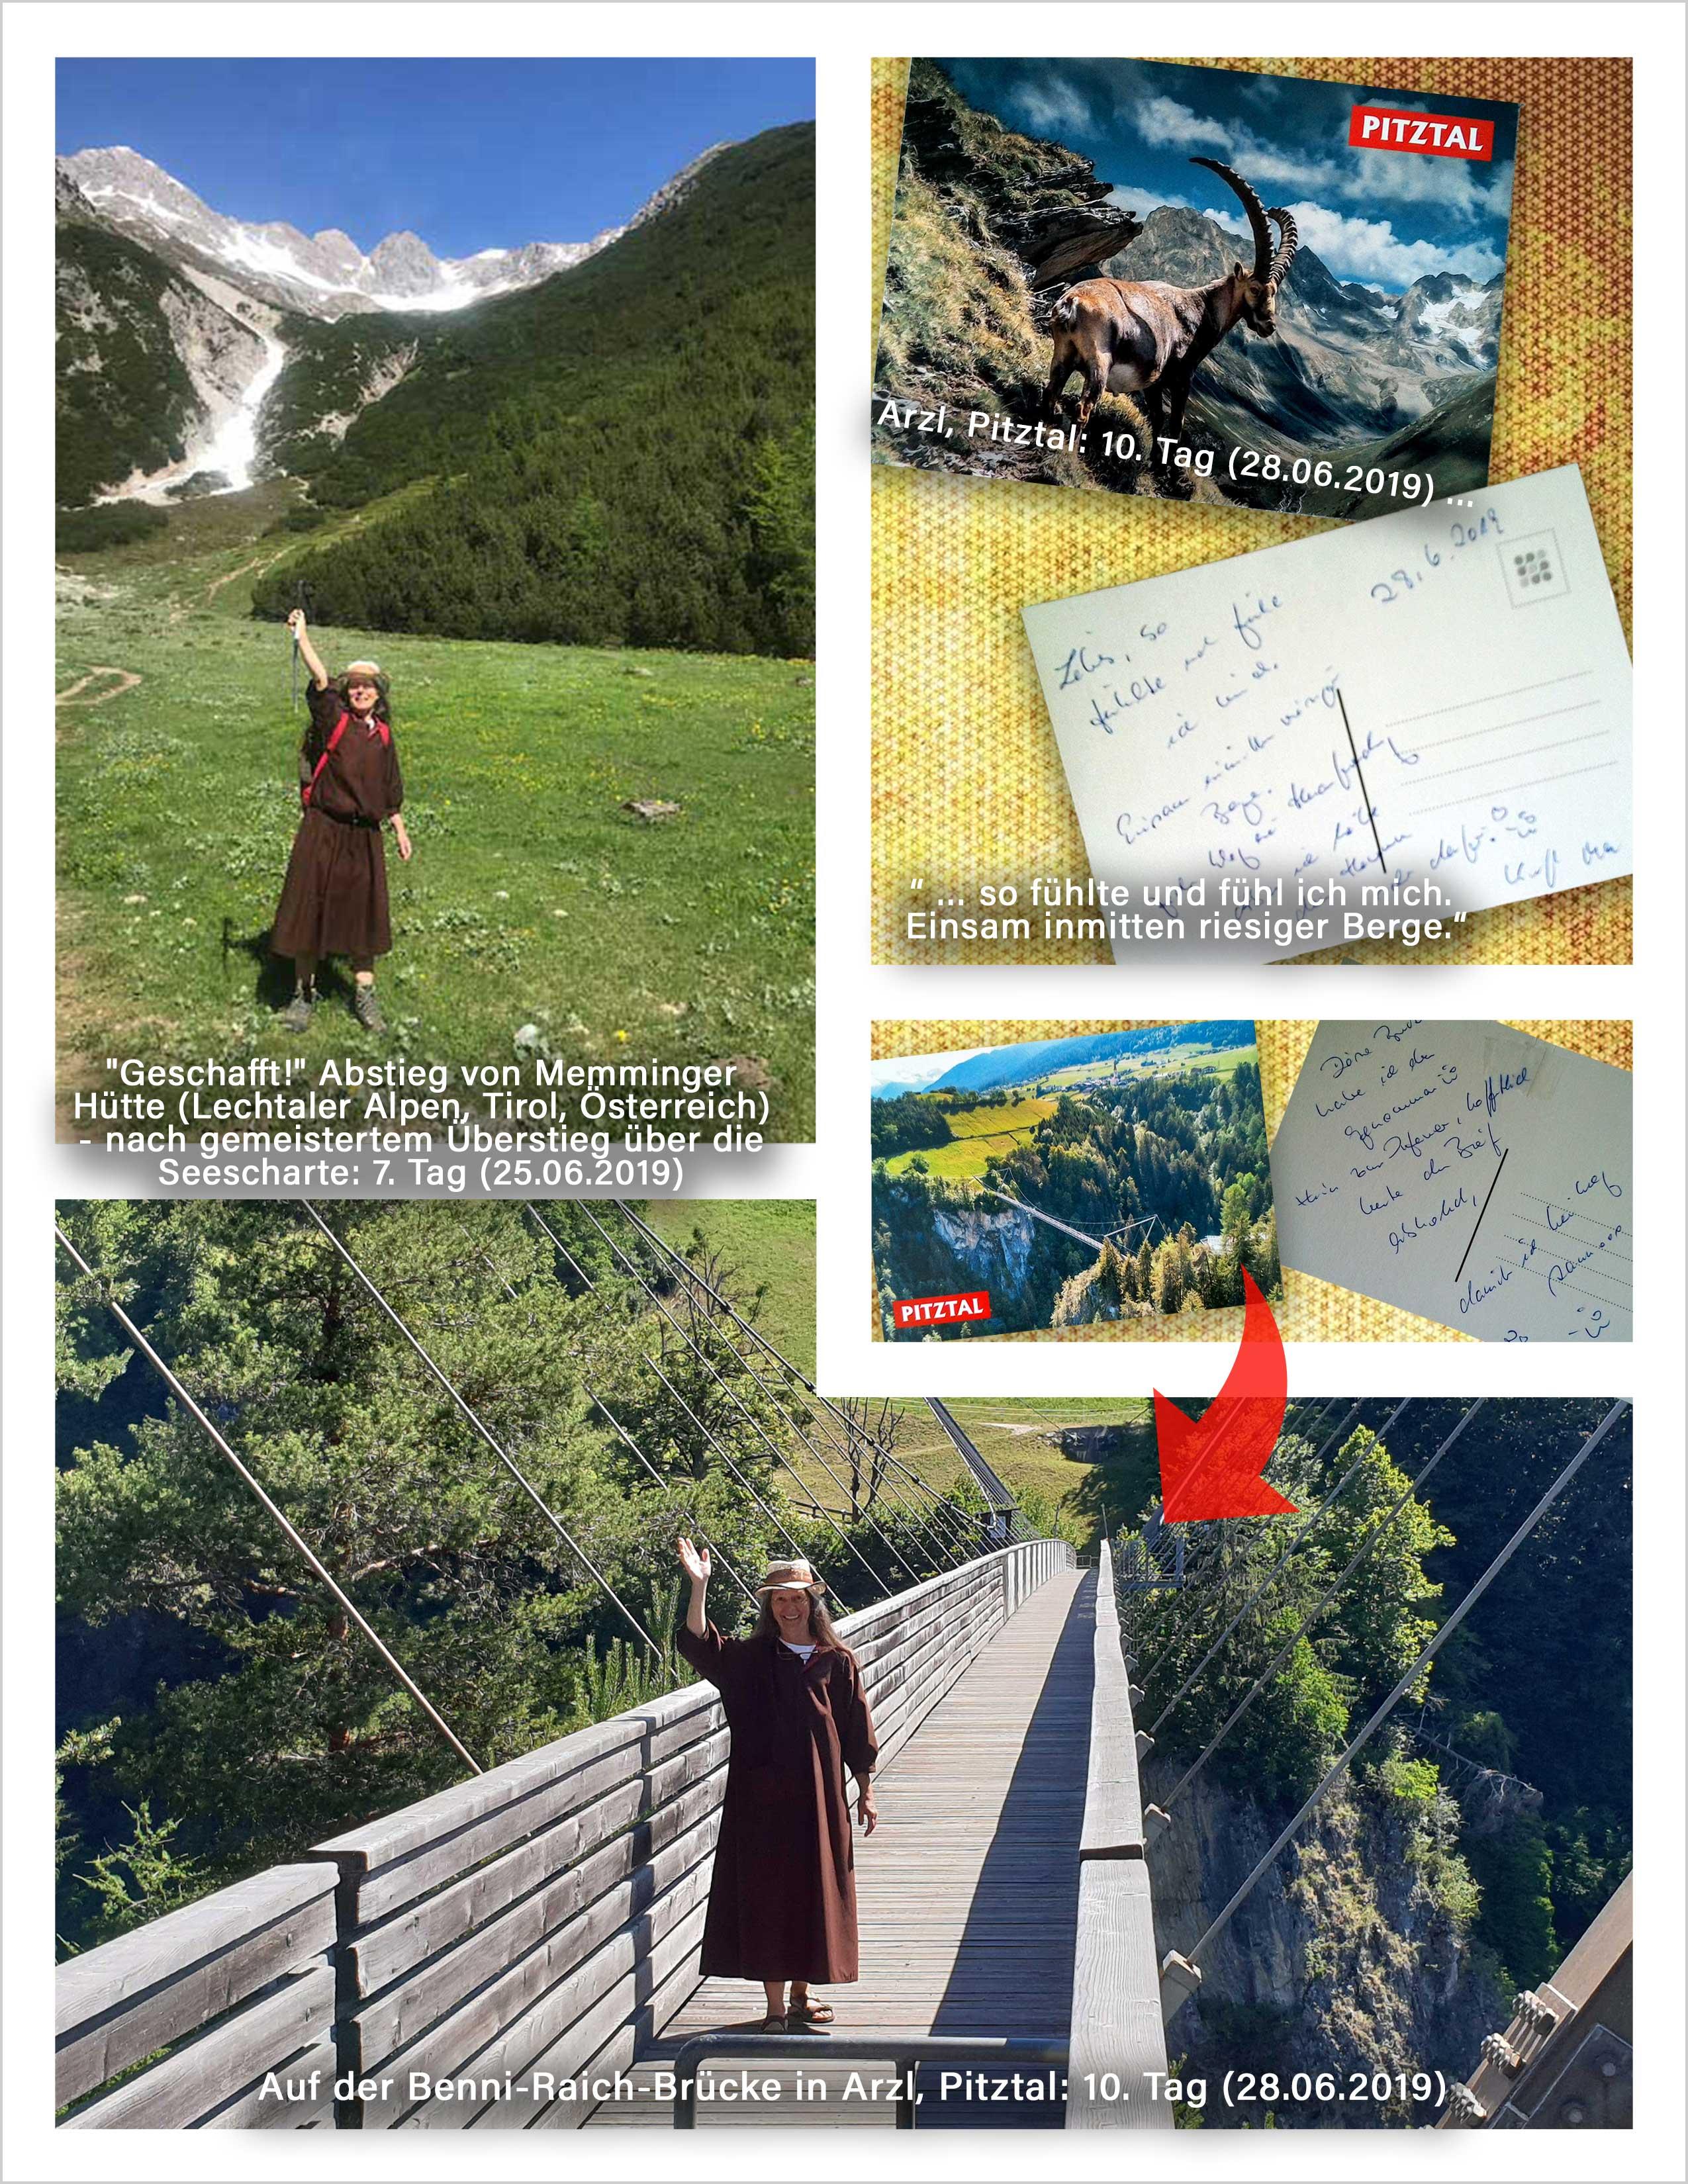 memminger-huette-seescharte-pitztal-zweite-pilgerreise-zu-fuss-nach-rom